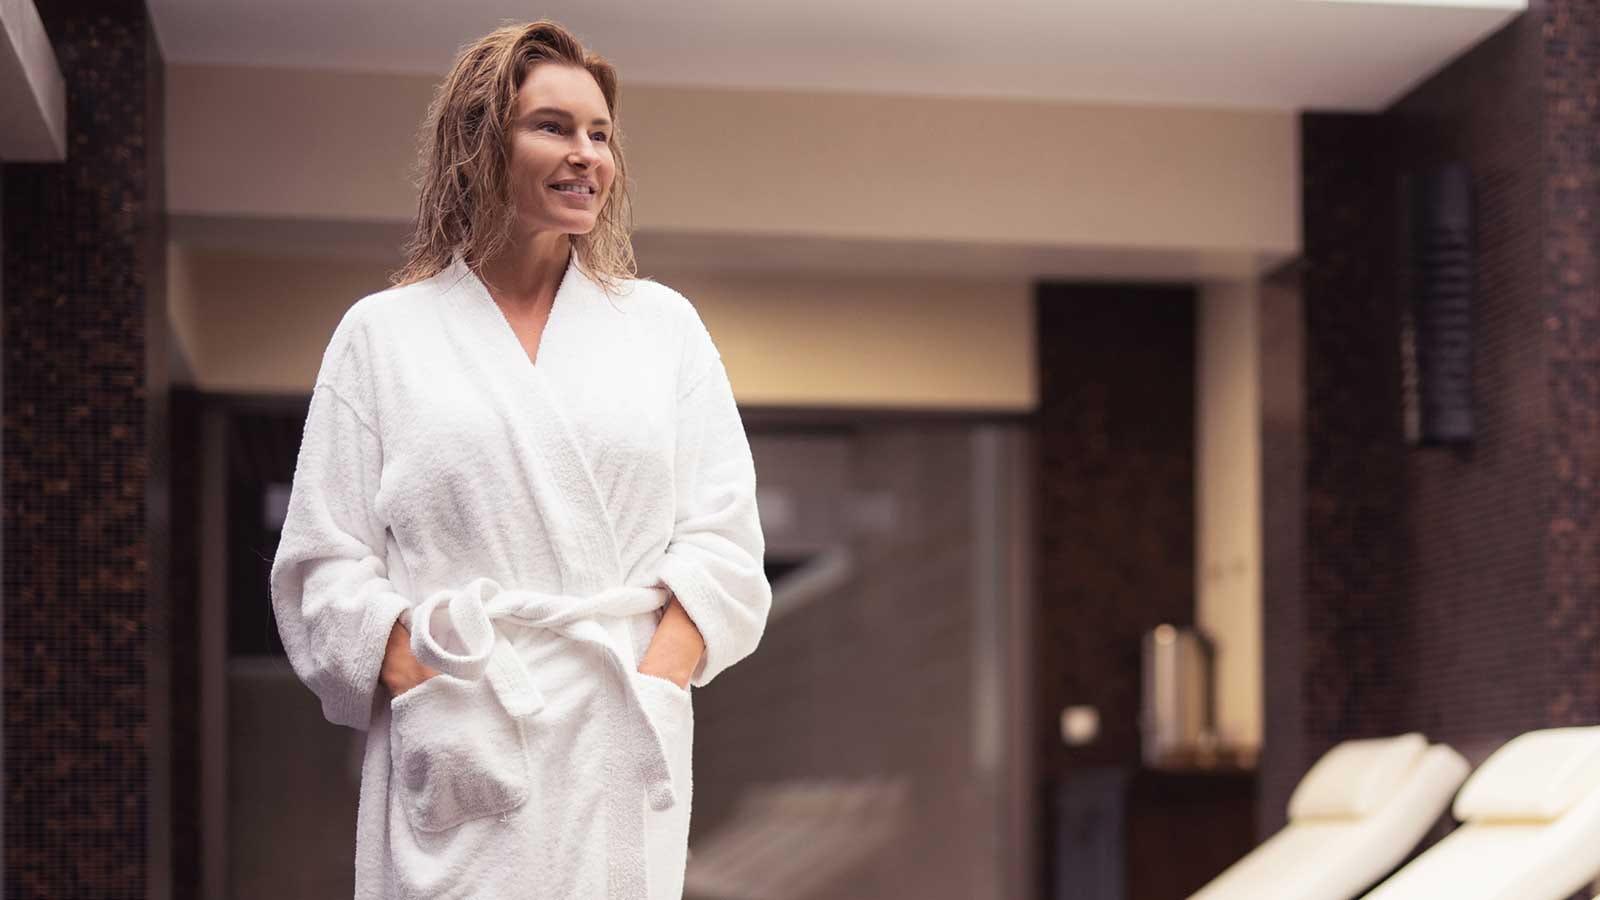 A woman wearing a comfortable bathrobe in a spa.